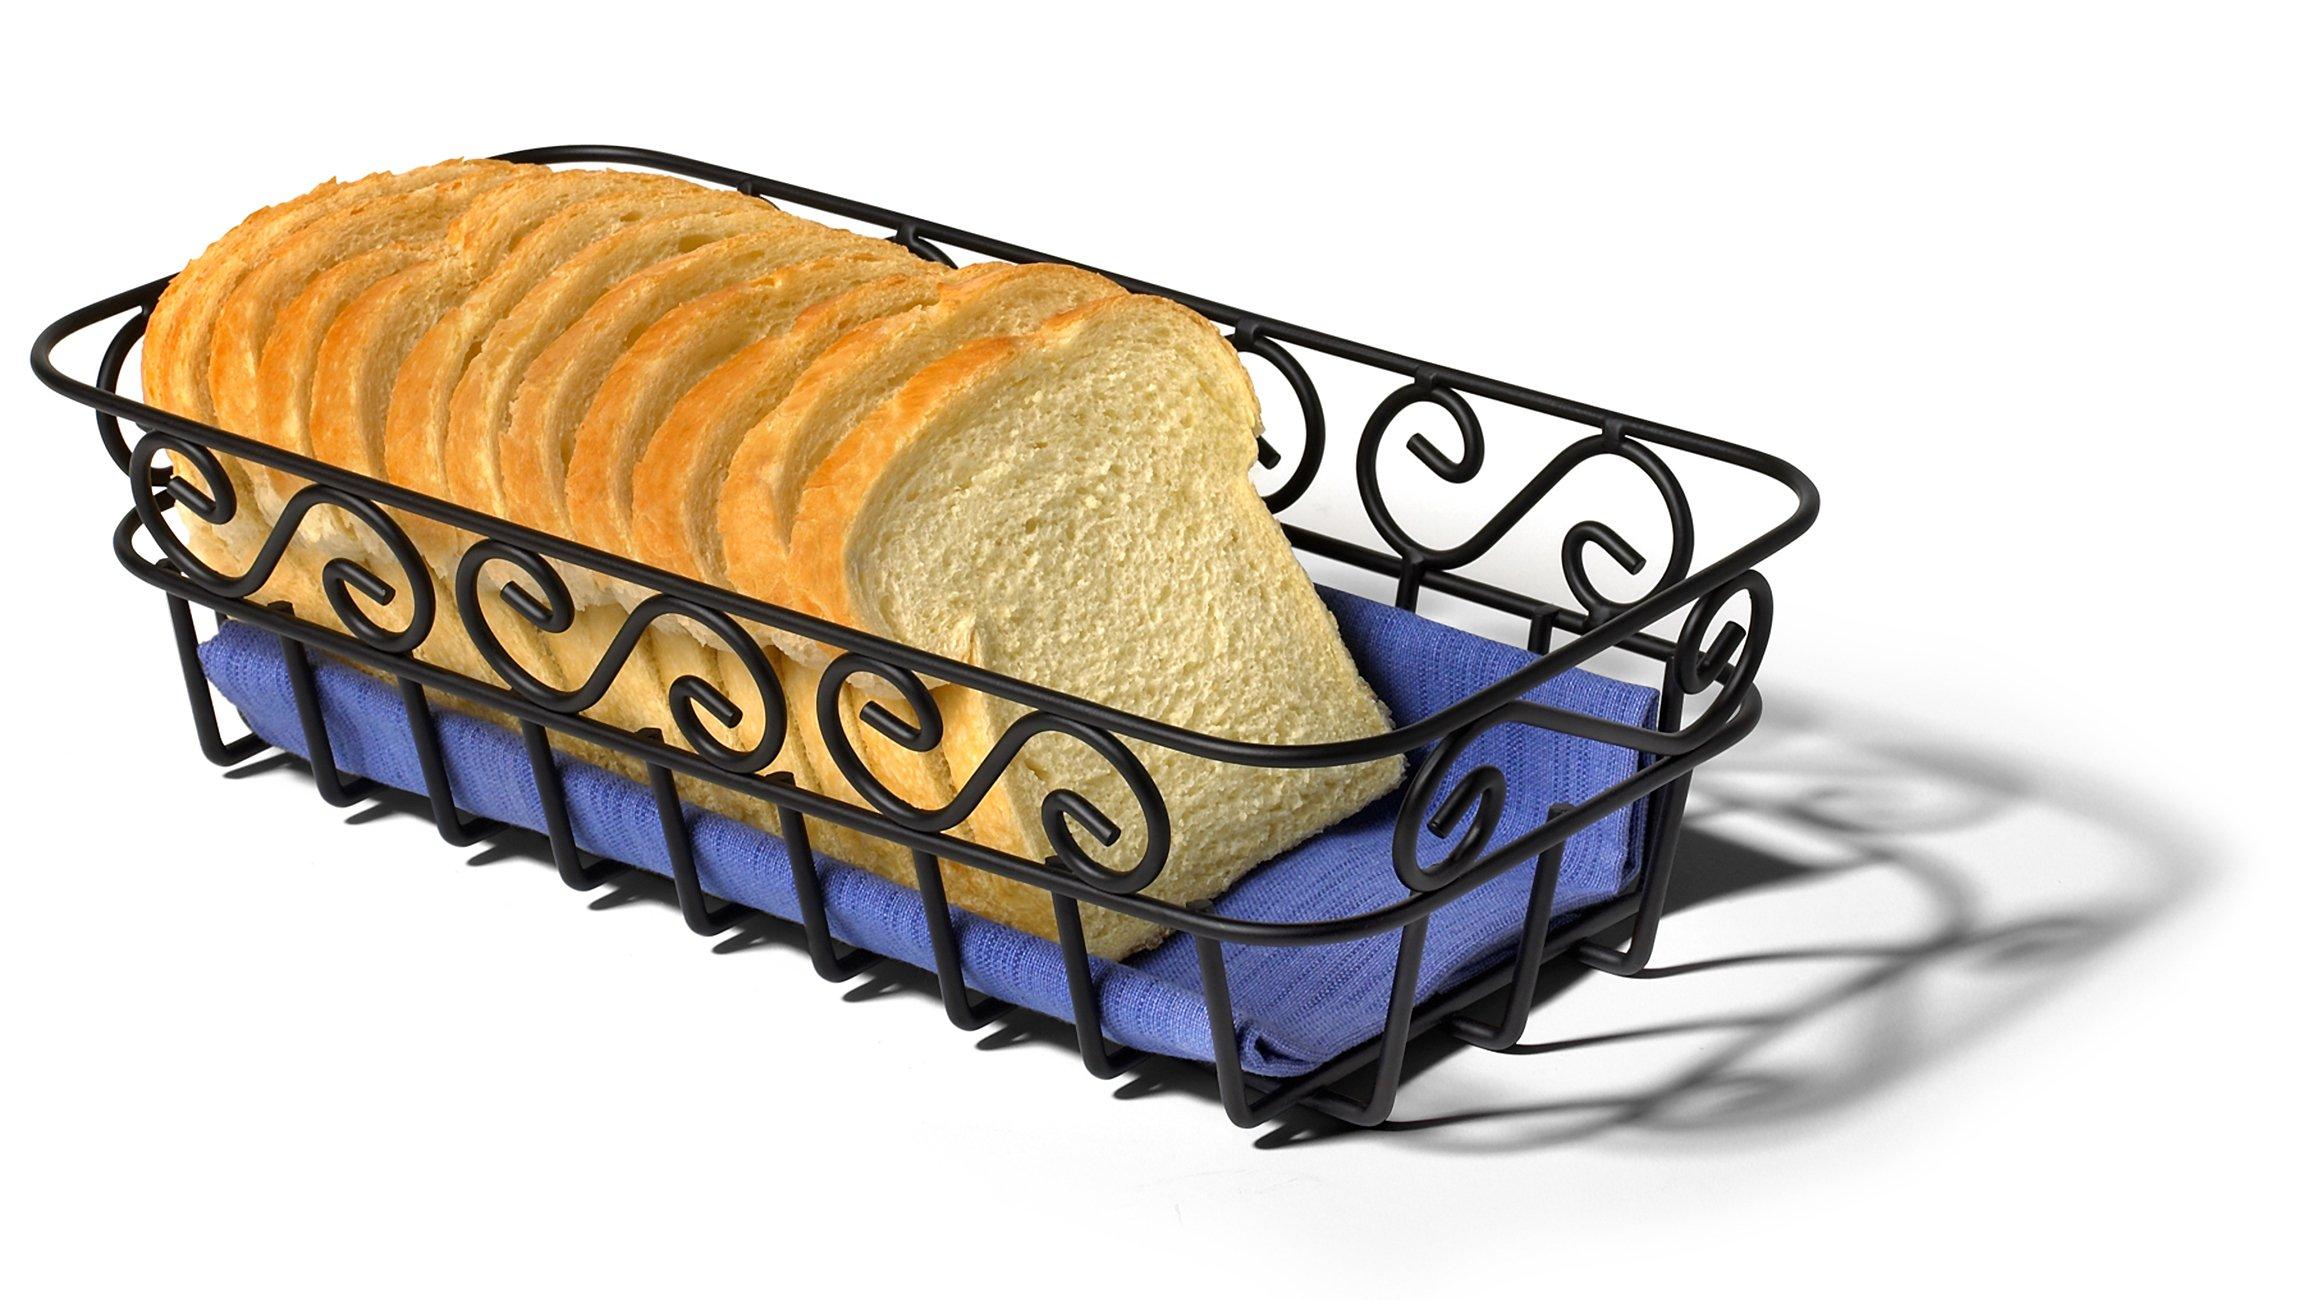 Spectrum Diversified Scroll Bread Basket, Black